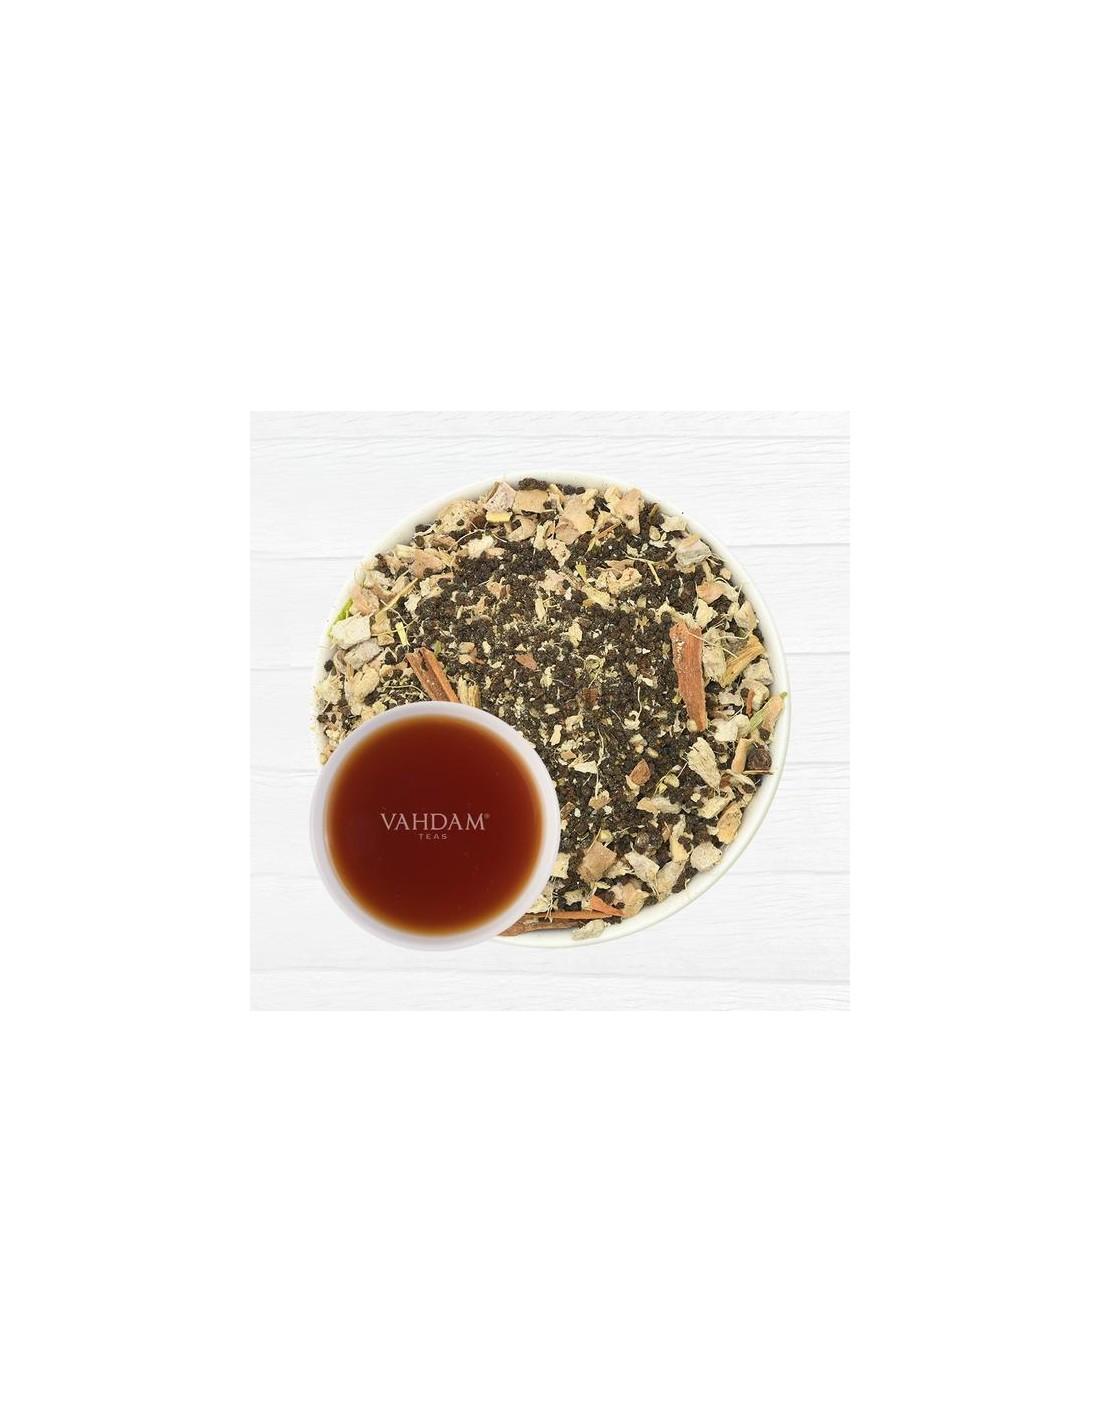 Ginger Masala Chai Tea - Republika Smaków Sp. z o.o.